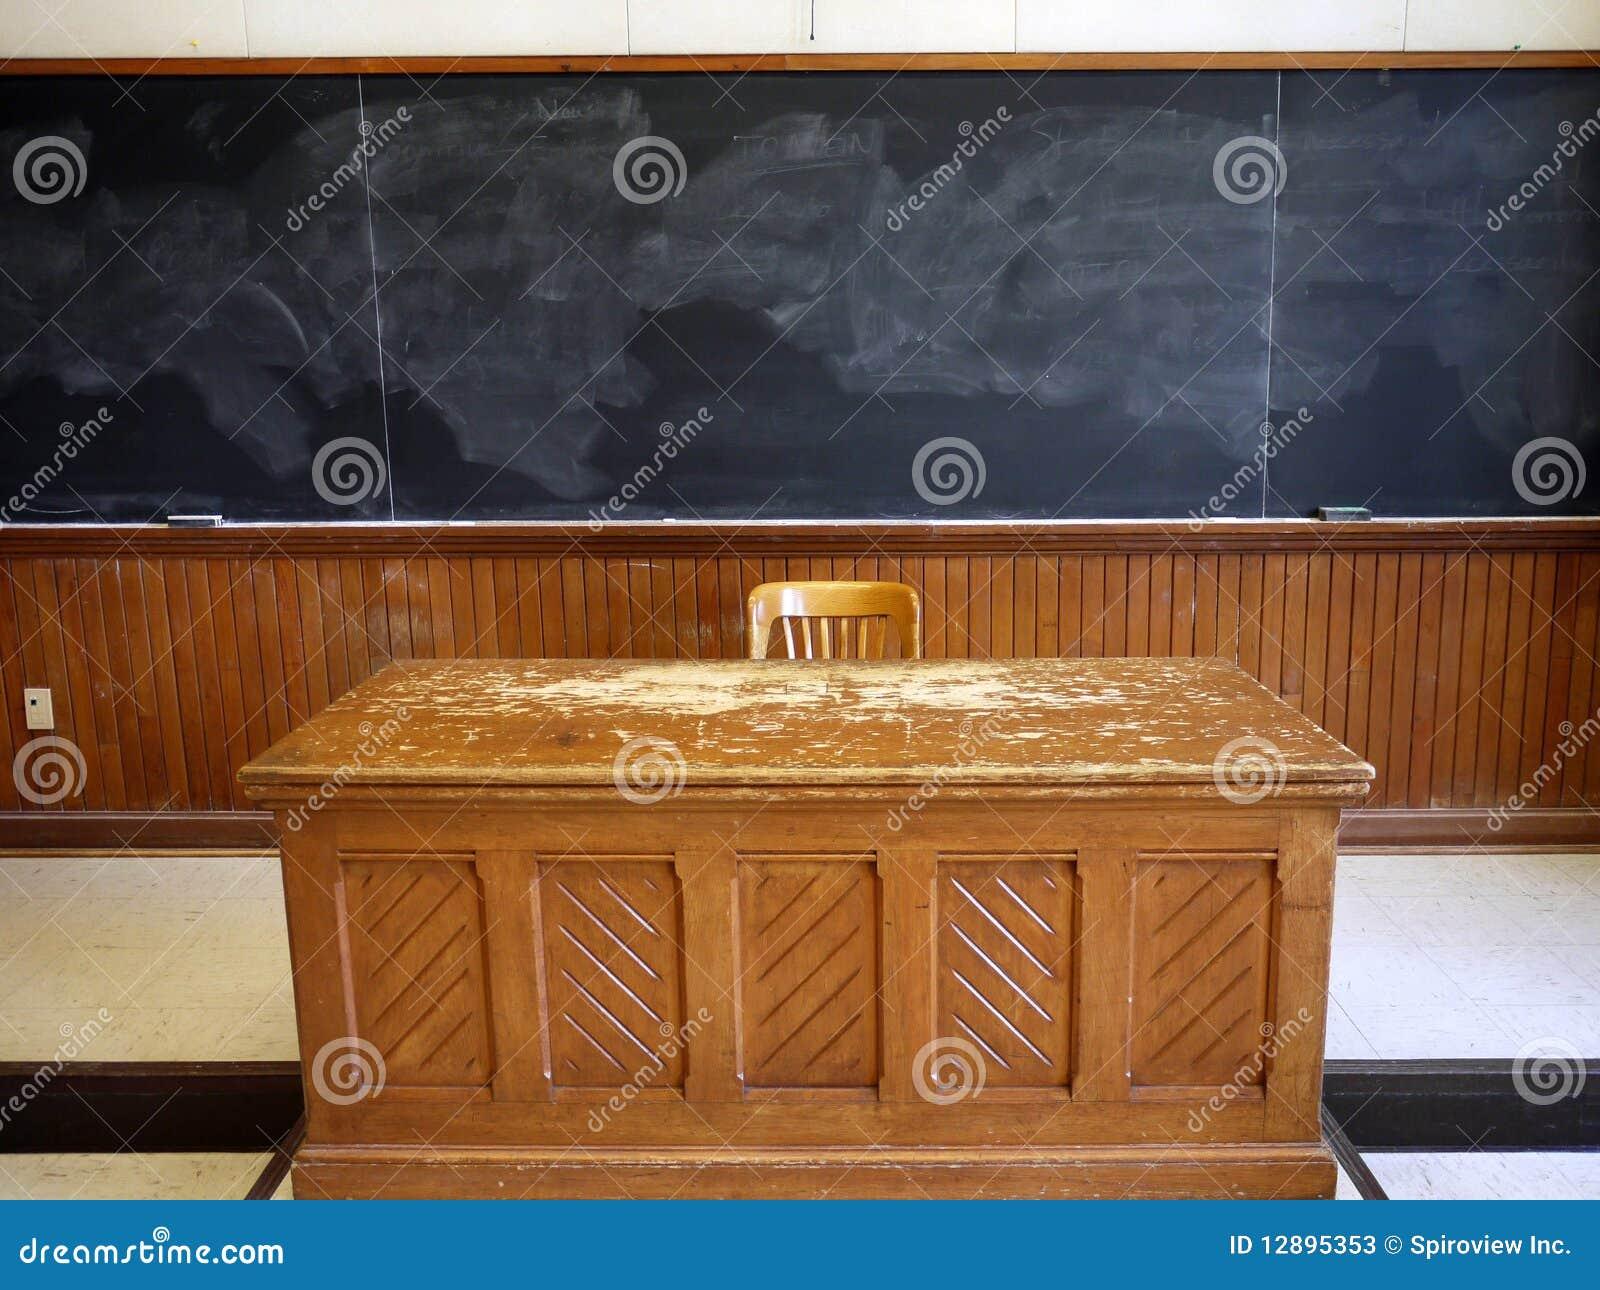 Old teacher's desk Stock Photos - Old School Chair Stock Image - Image: 28166601